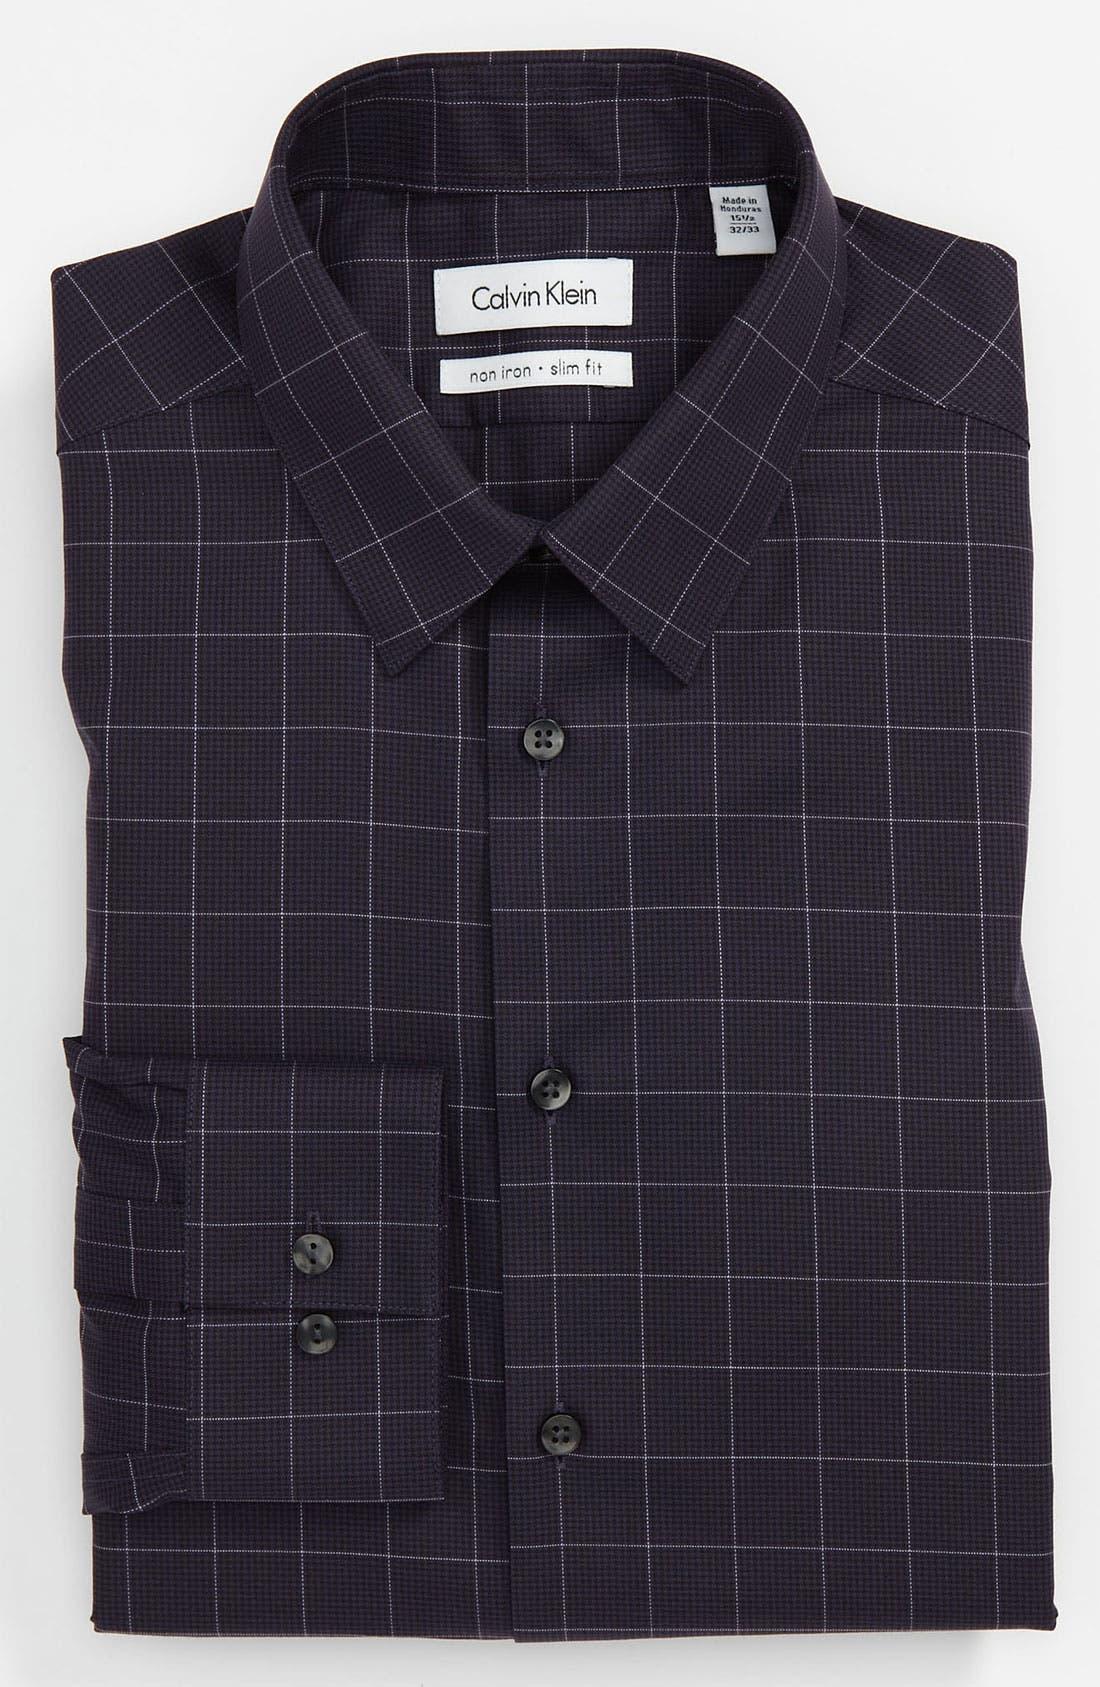 Alternate Image 1 Selected - Calvin Klein Slim Fit Non-Iron Dress Shirt